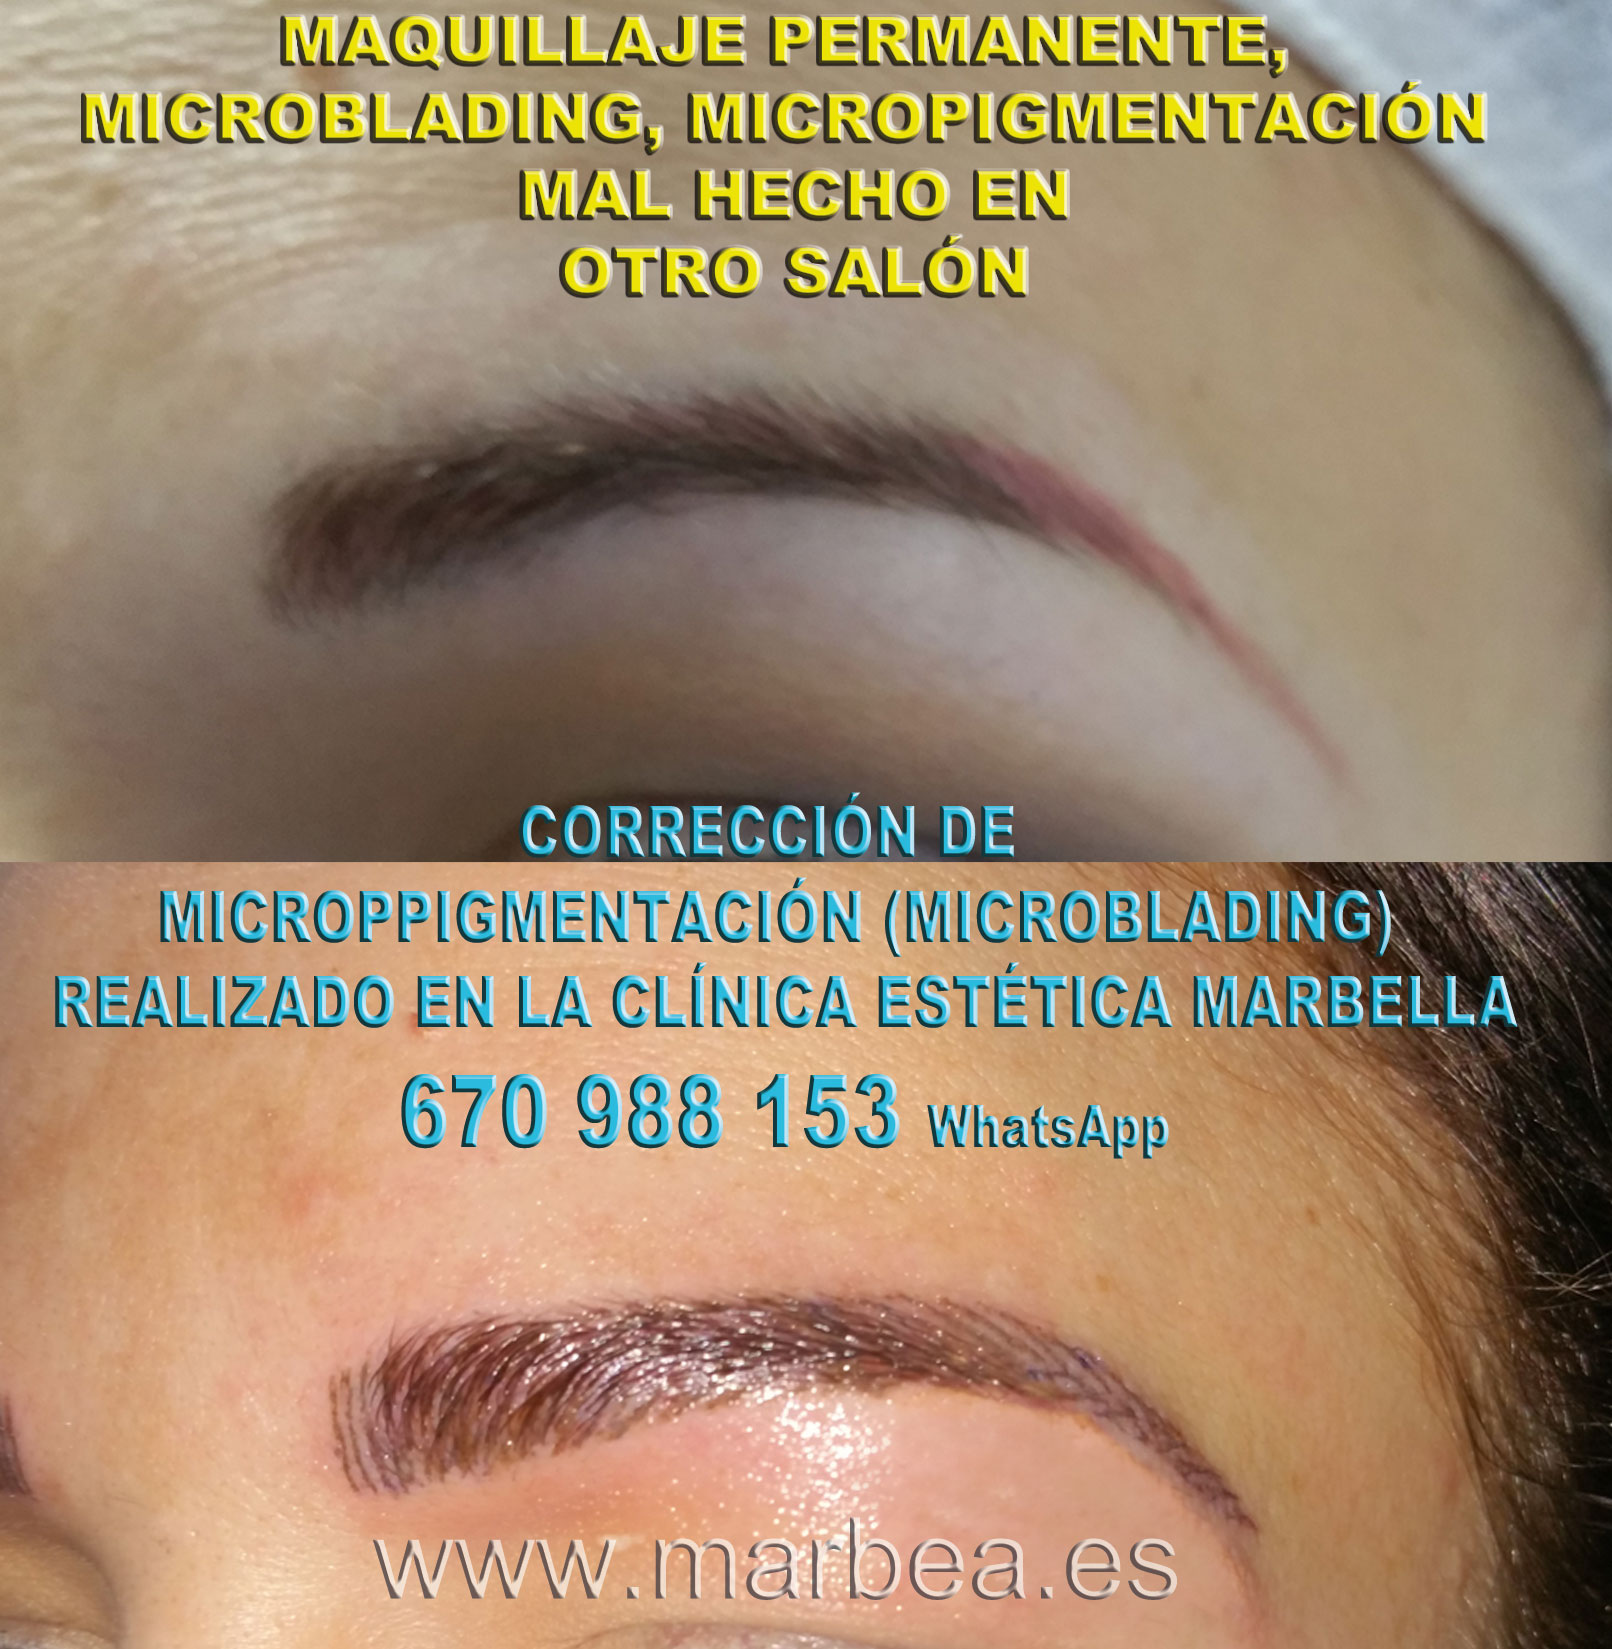 ELIMINAR TATUAJE CEJAS clínica estética delineados entrega micropigmentacion correctiva de cejas,corregir micropigmentación mal hecha